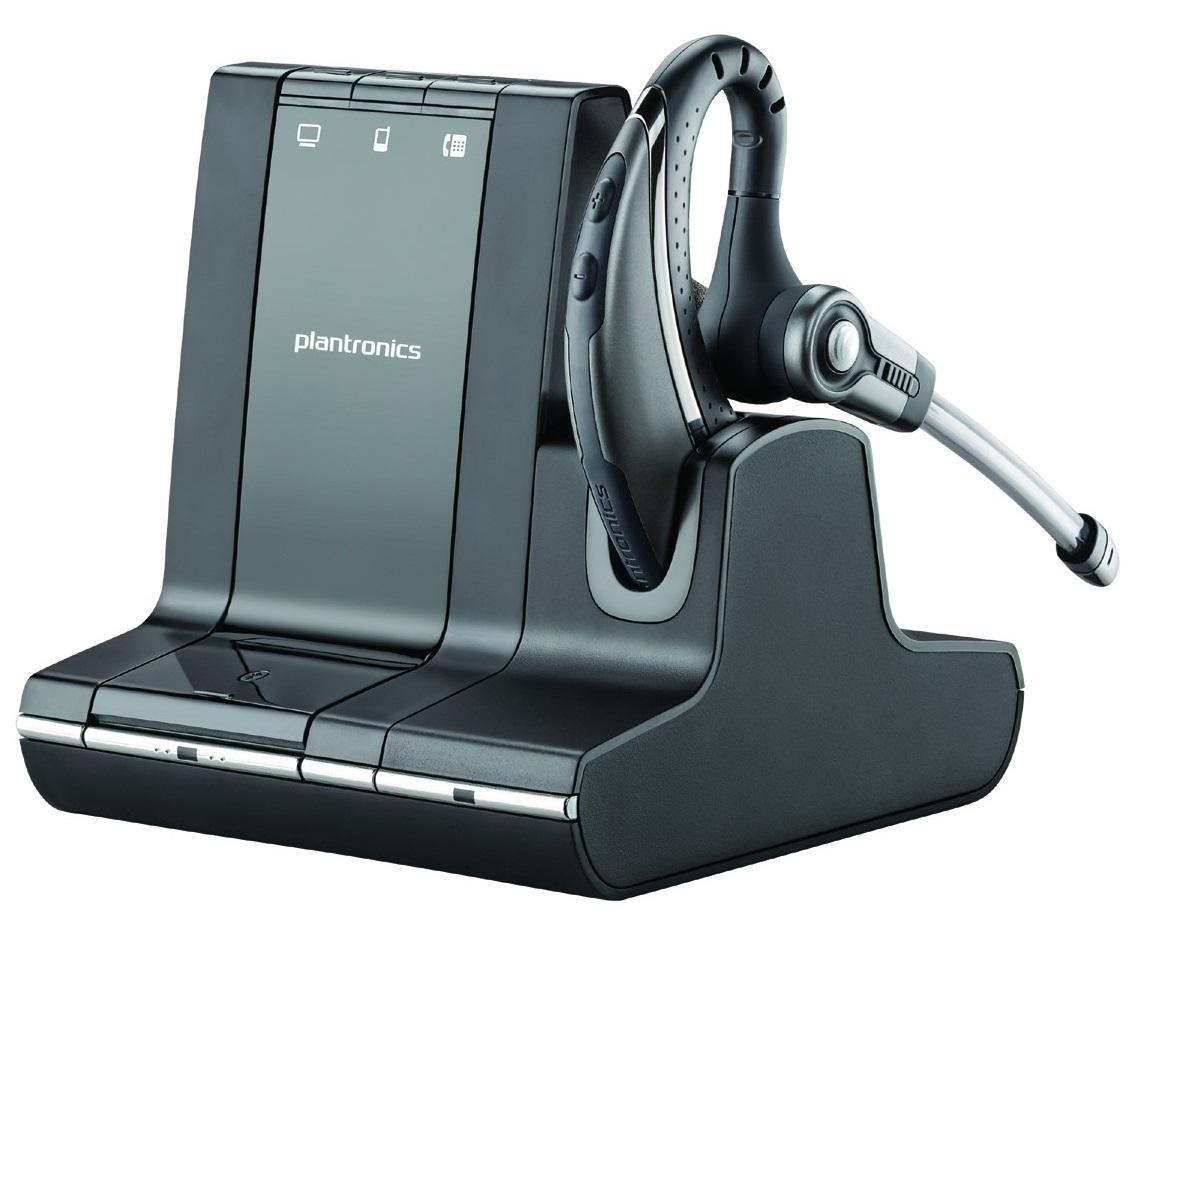 Savi W730a Plantronics Phone Headsets